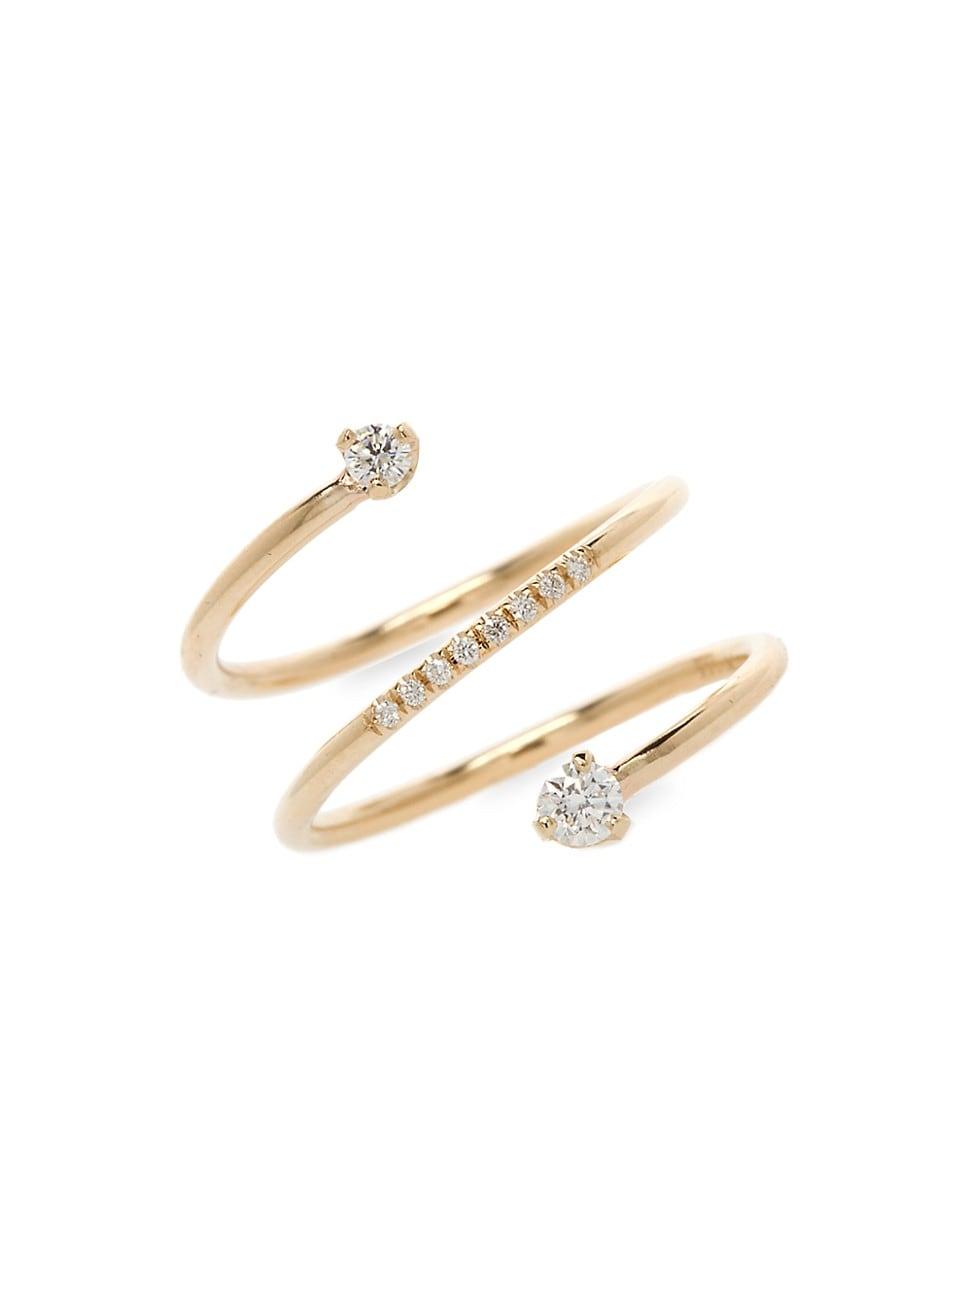 Zoë Chicco Women's 14k Yellow Gold & Diamond Spiral Ring